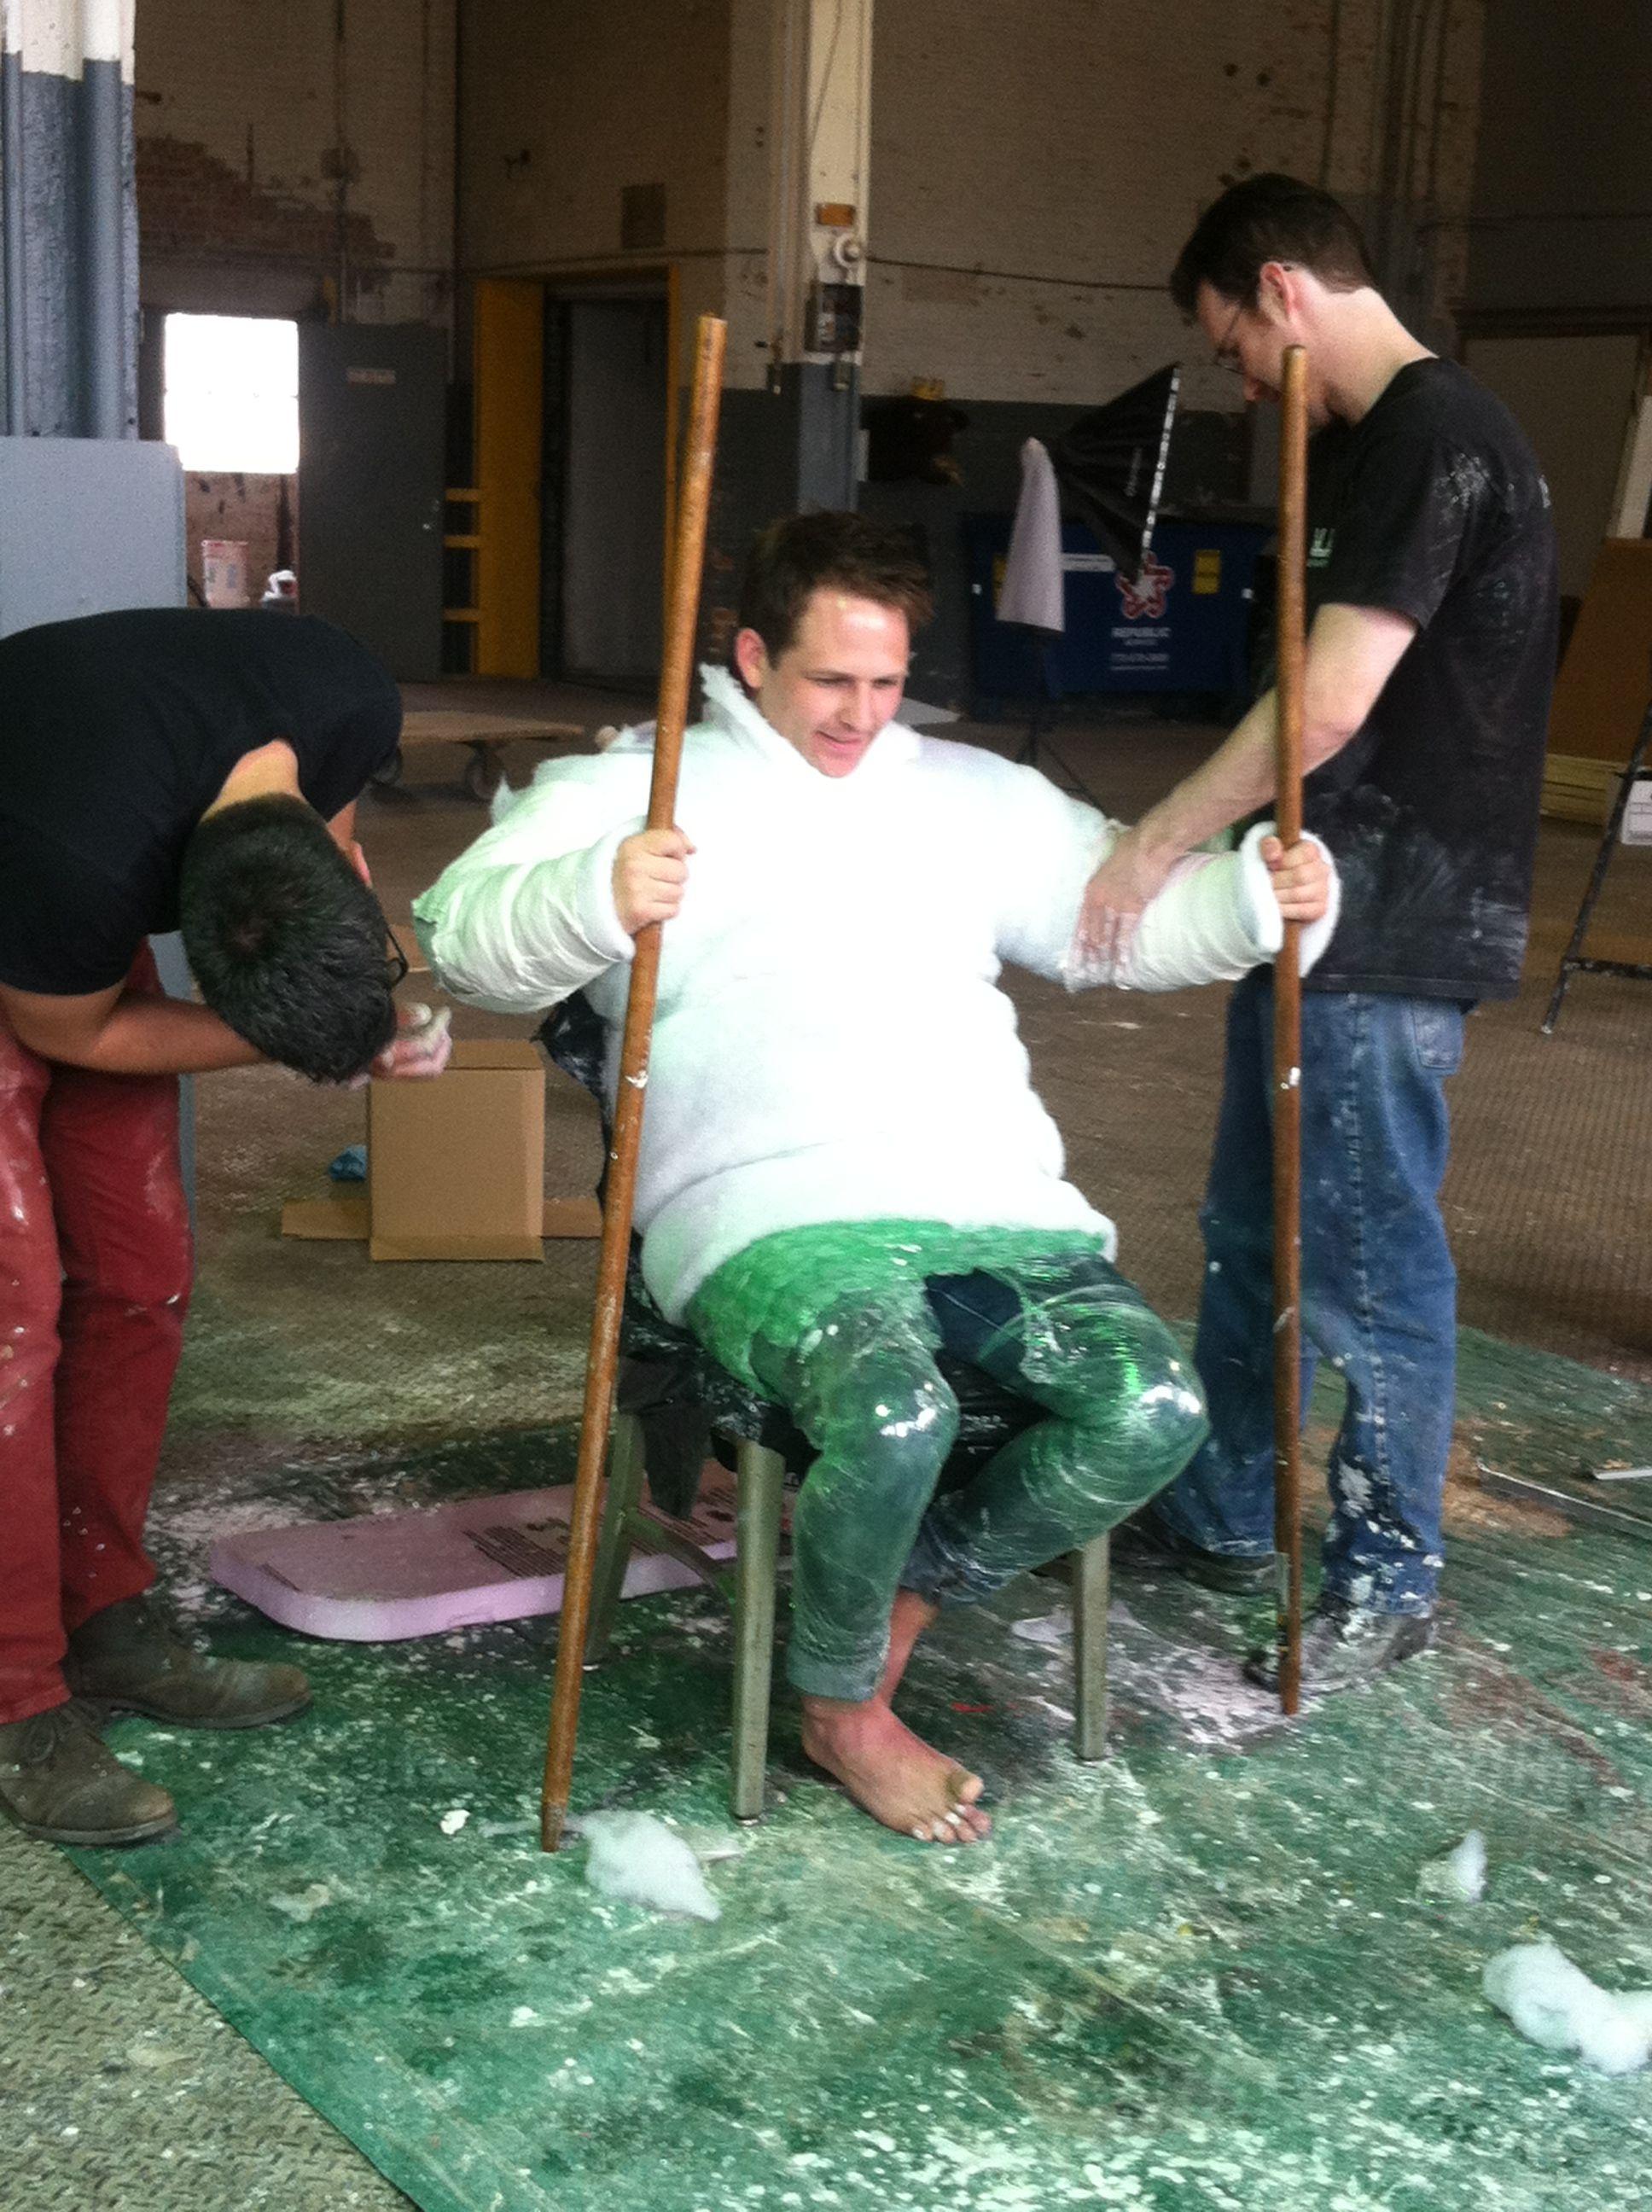 Making a full body cast - Illumivation Studios